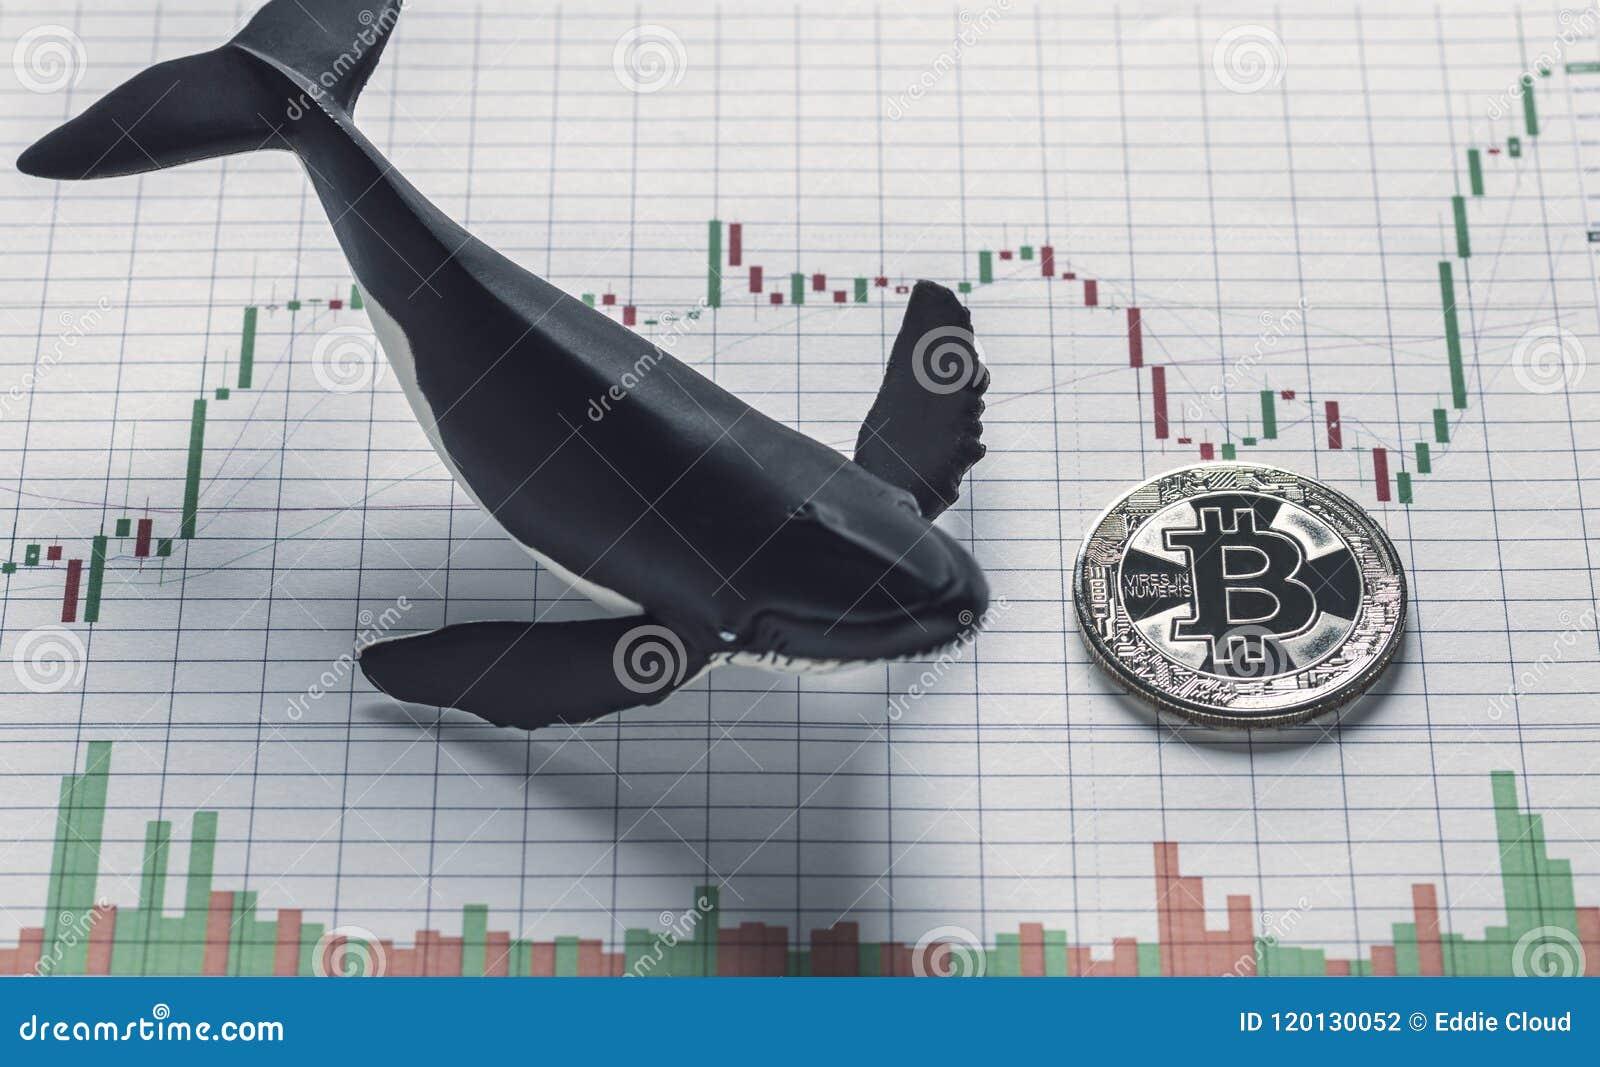 Bitcoin Whale Holder Conceptual Image